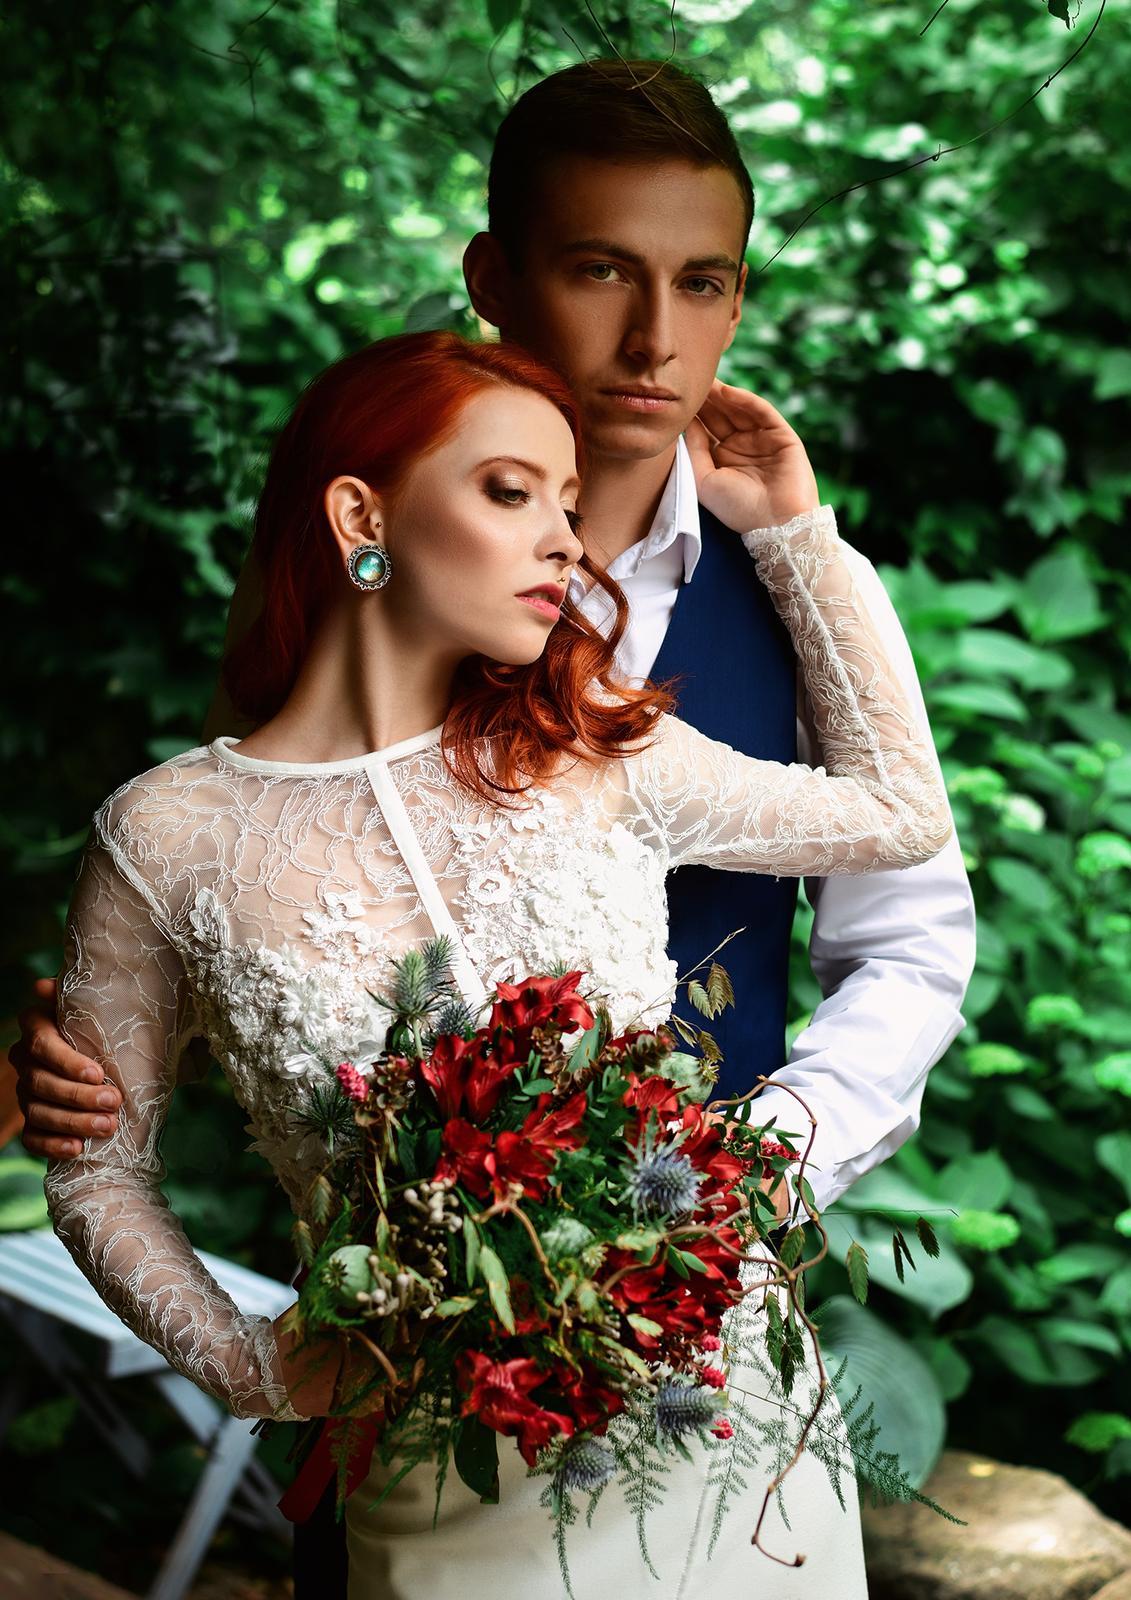 kristynaduskova_makeup - Obrázek č. 1